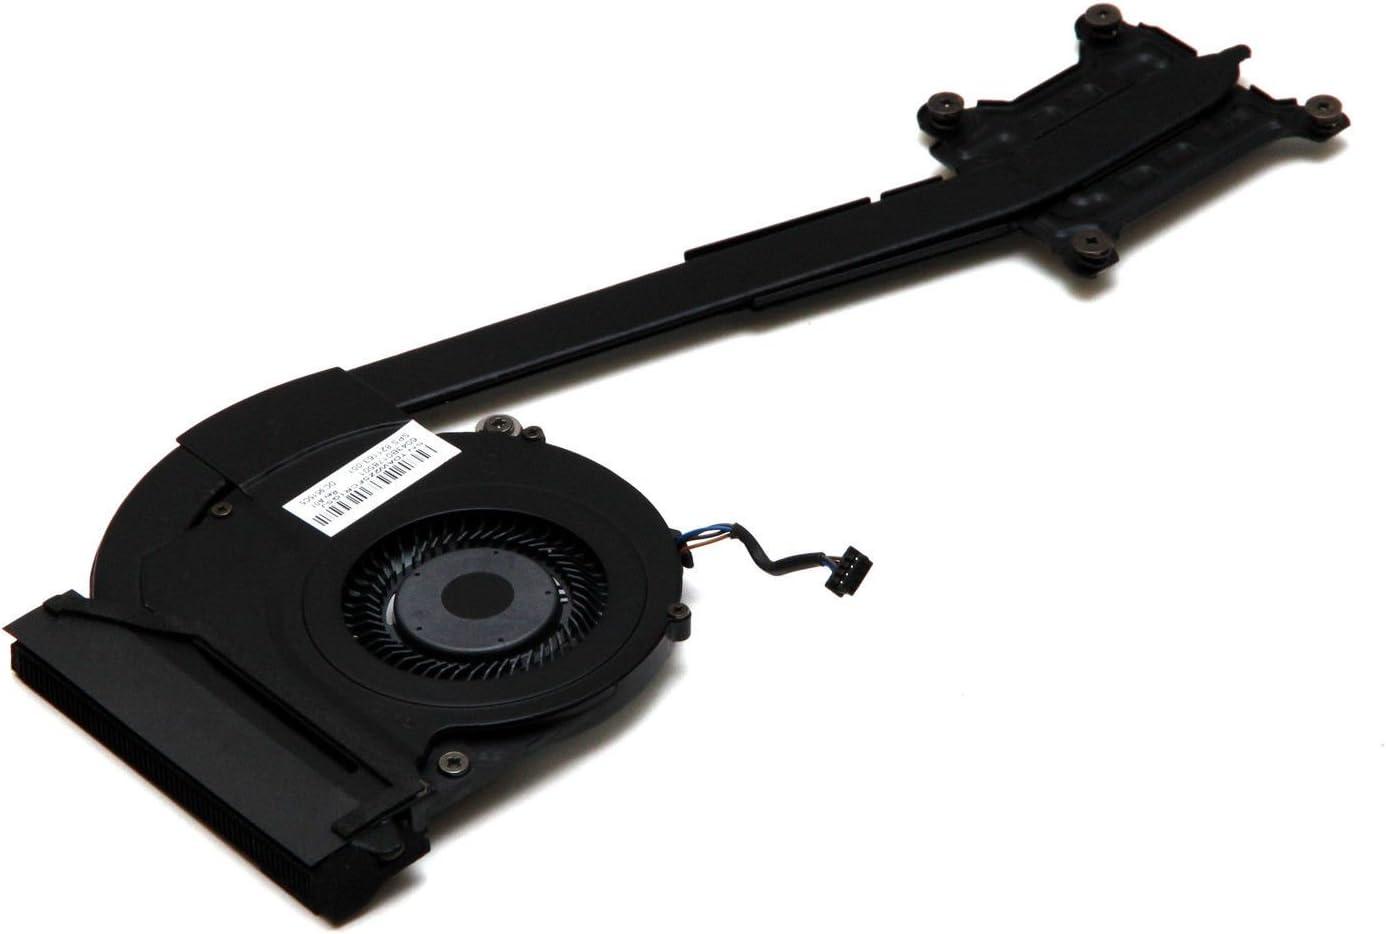 HP New Genuine EliteBook 840 G3 Cooling Heatsink and Fan NS65C00-14M16 821163-001